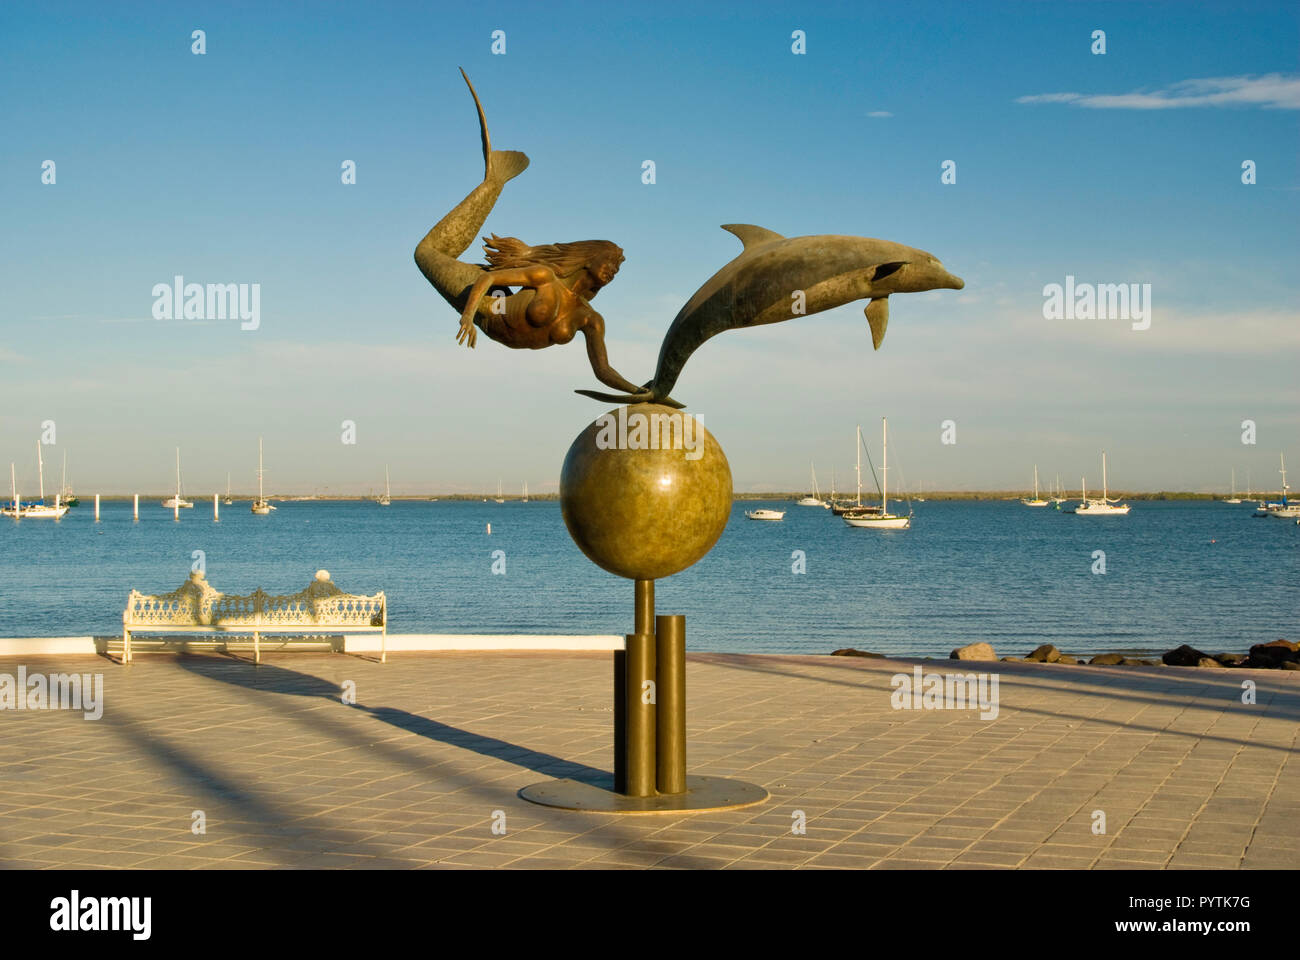 Paraiso del mar (Paradise of the Sea) sculpture by Octavio Gonzalez at Malecon, La Paz, Baja California Sur, Mexico Stock Photo